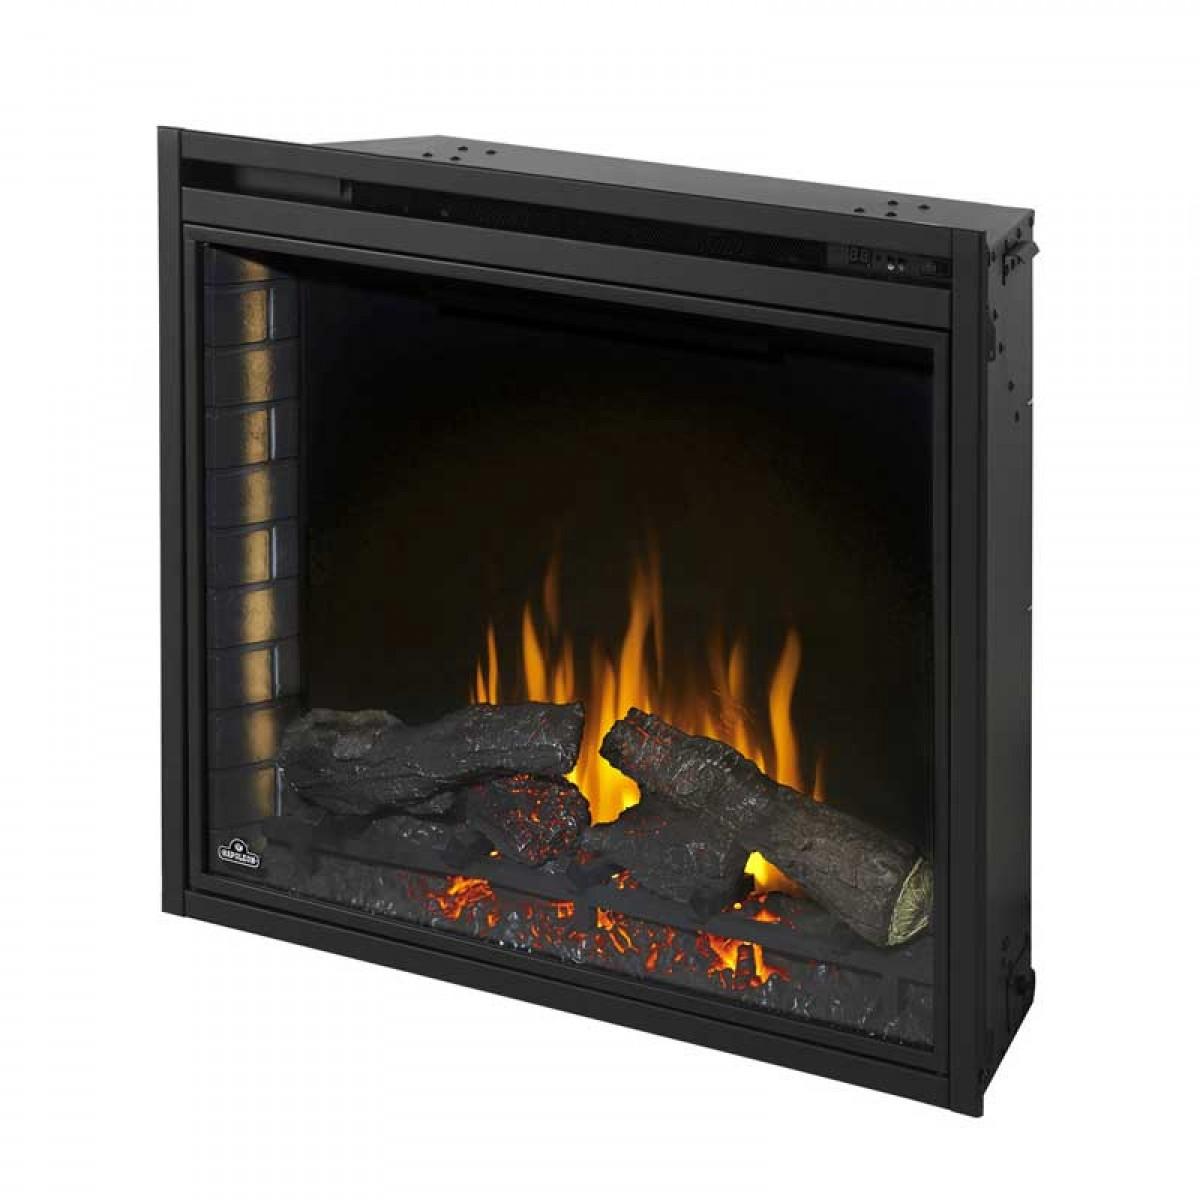 100 Gas Fireplace Log Set Napoleon Ascent 42 Gas Valor Fireplace Prices Gas